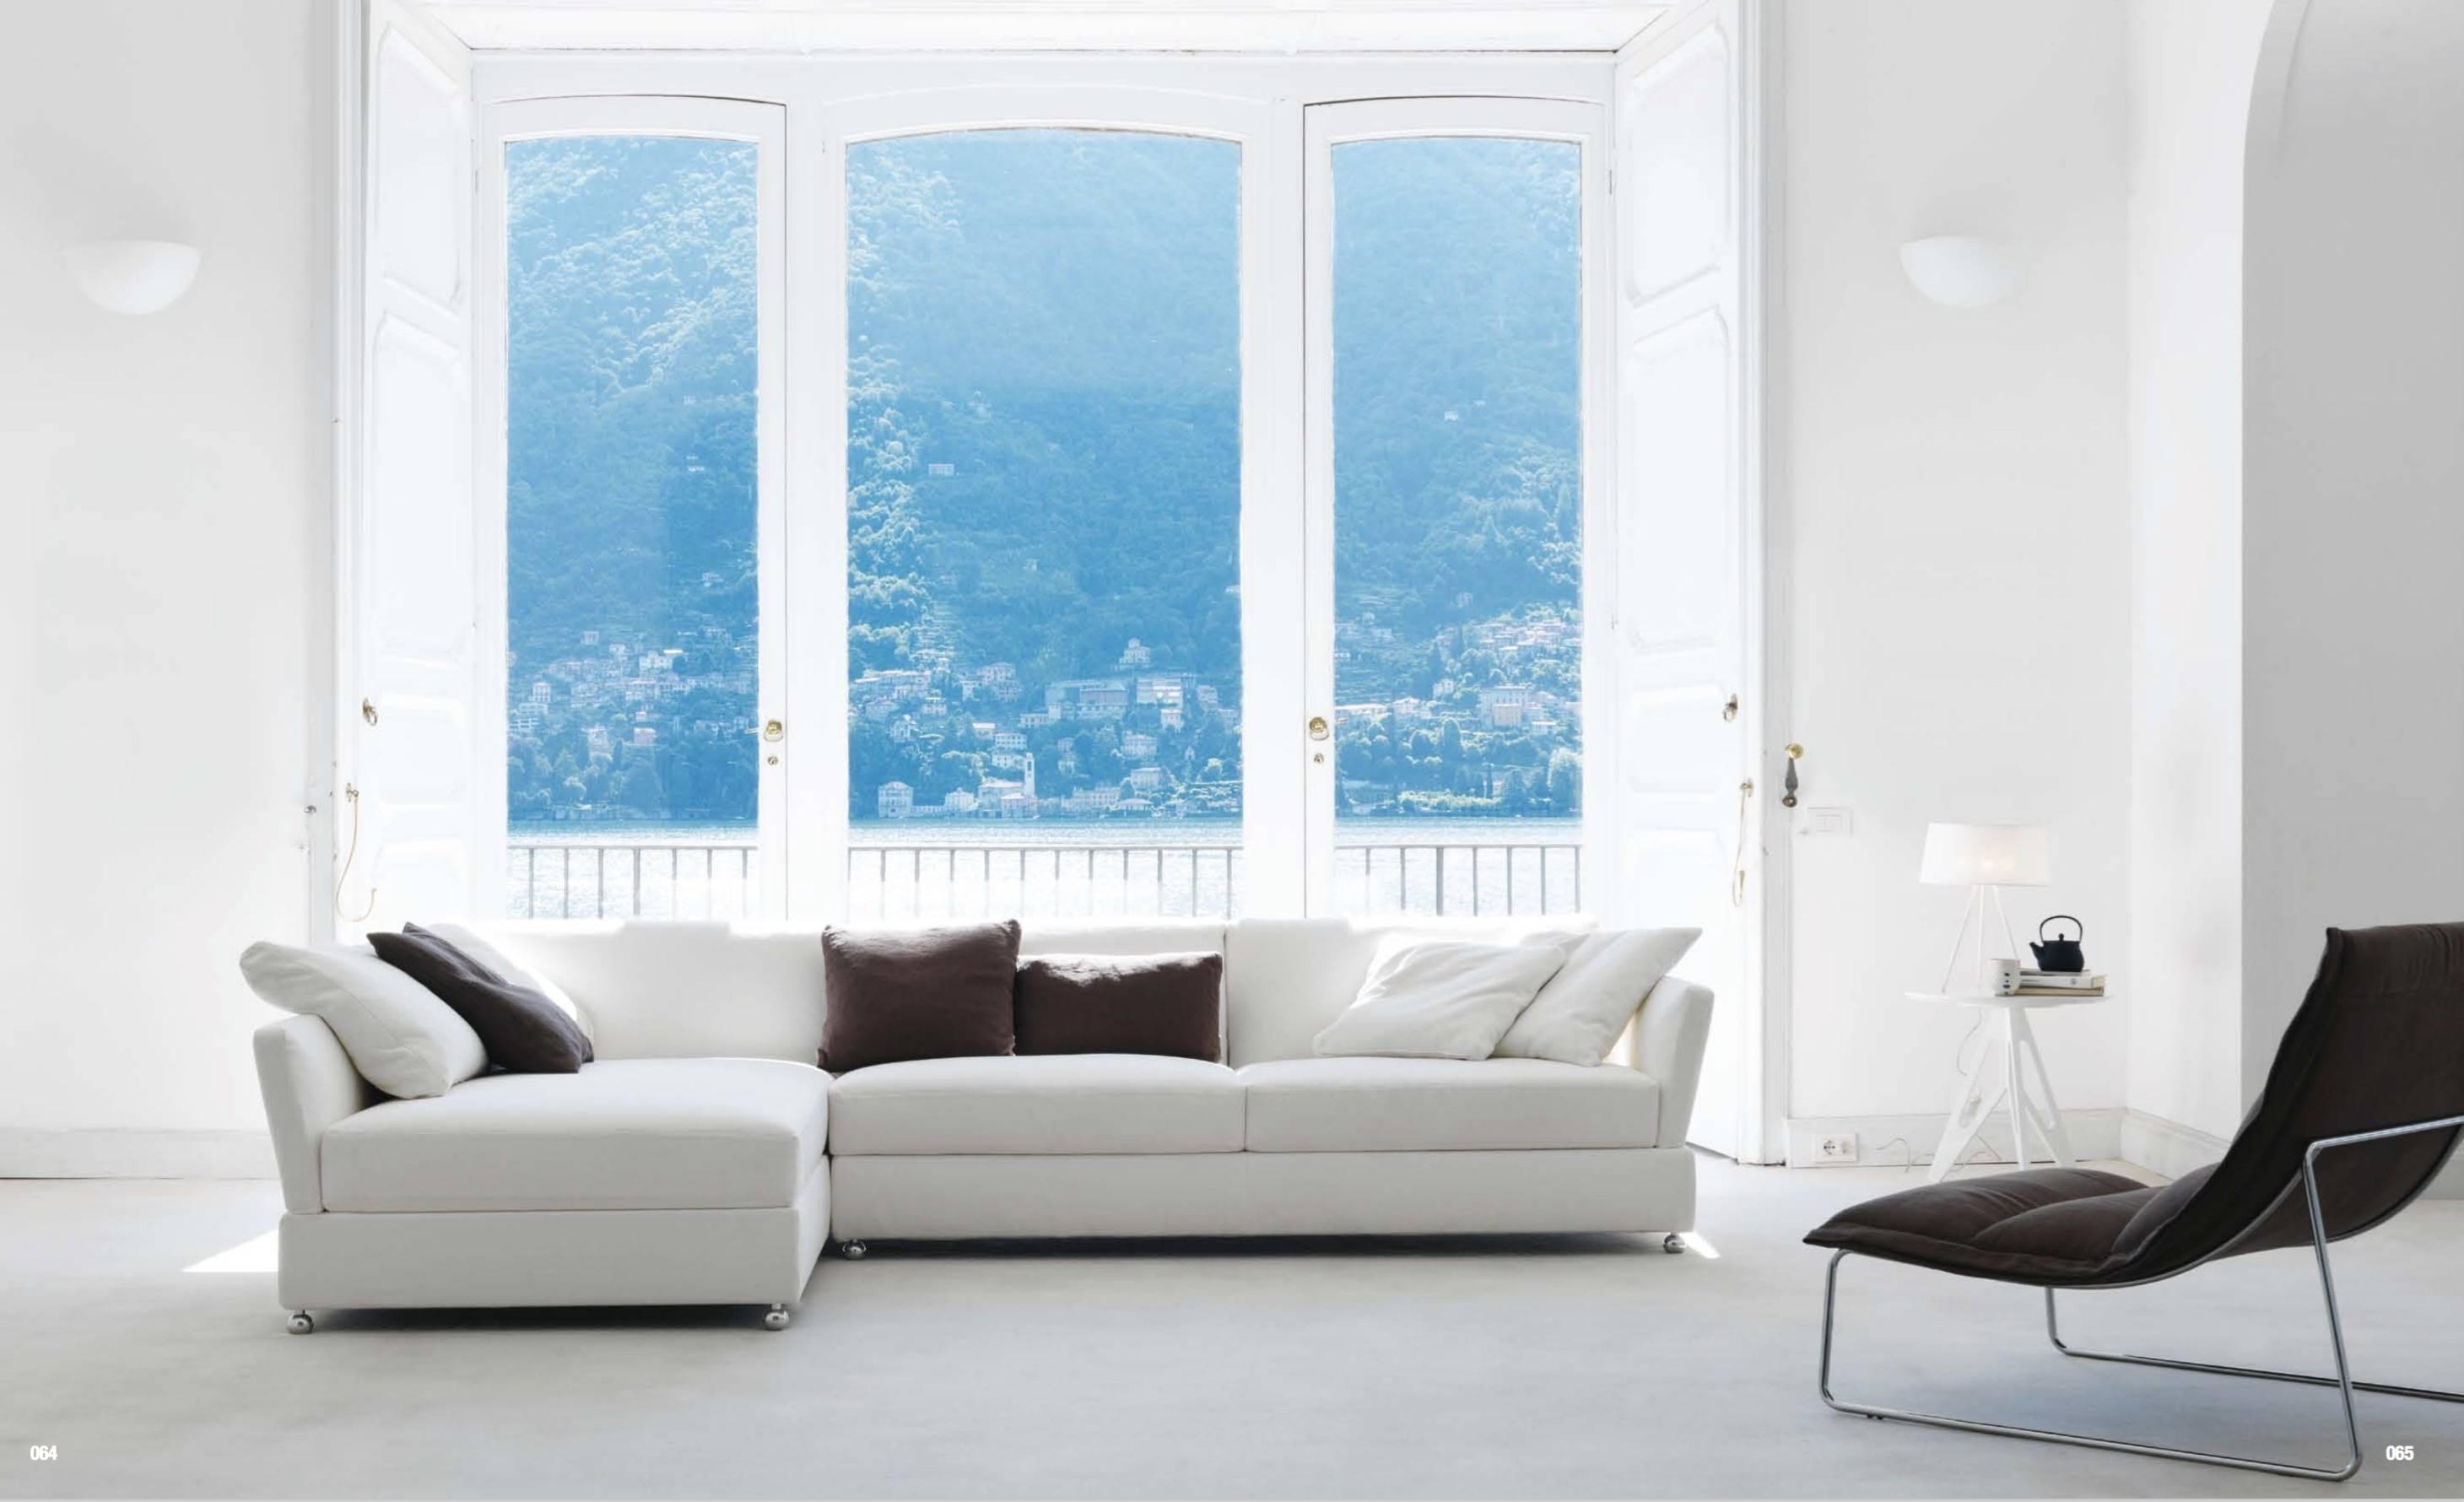 Italian Sofas At Momentoitalia - Modern Sofas,designer Sofas inside Down Filled Sectional Sofas (Image 13 of 30)